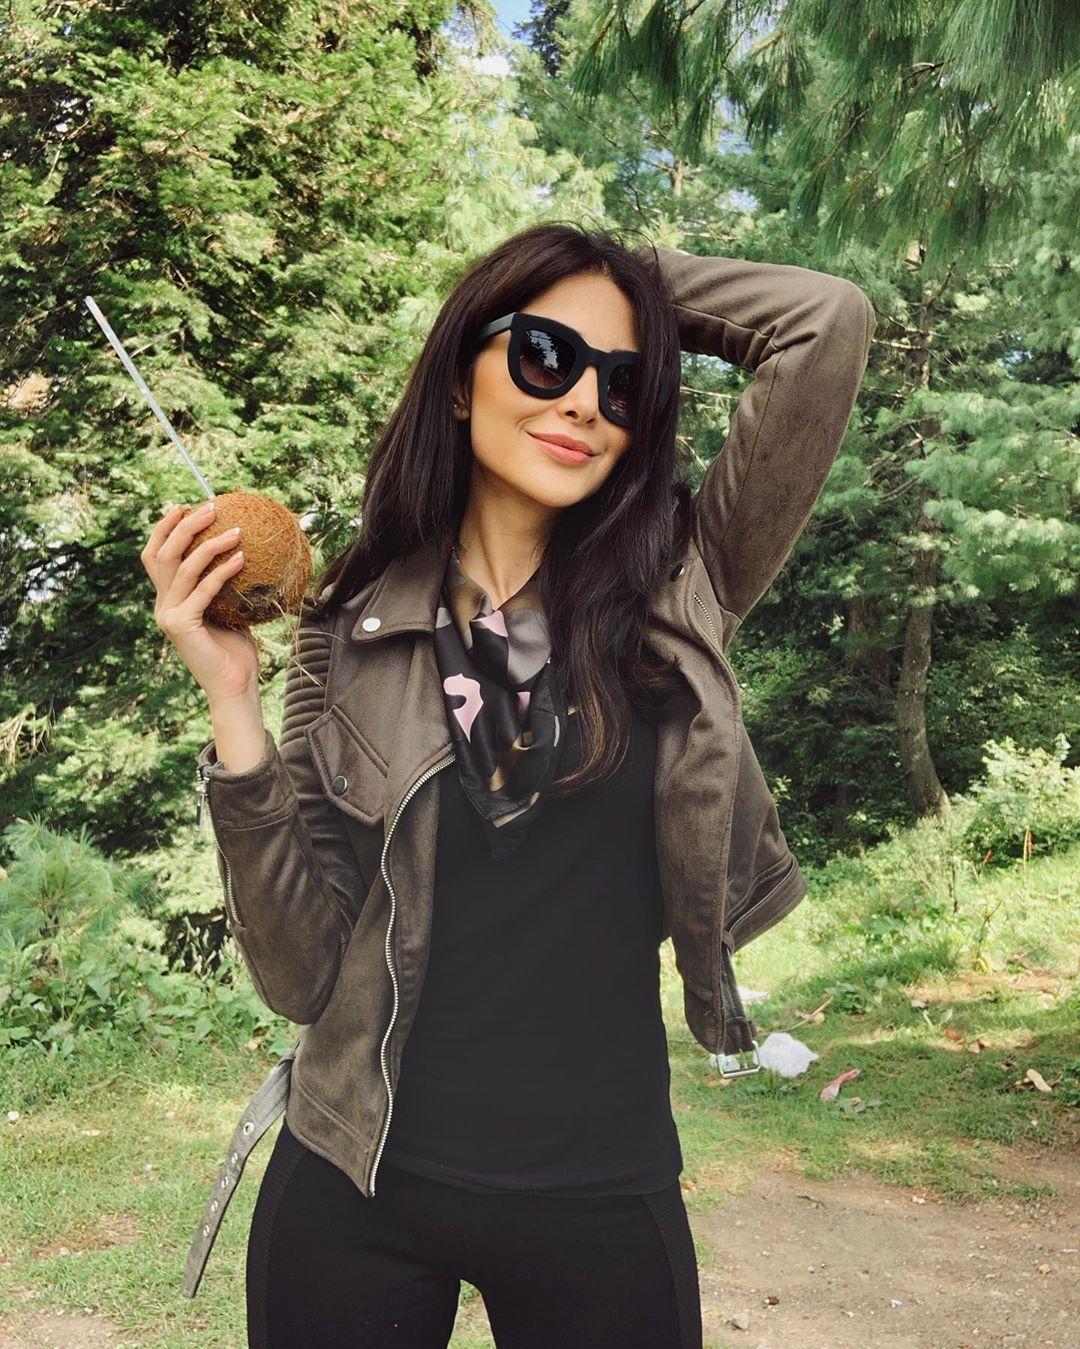 Model Sabeeka Imam Beautiful Pictures in Nathia Gali (9)